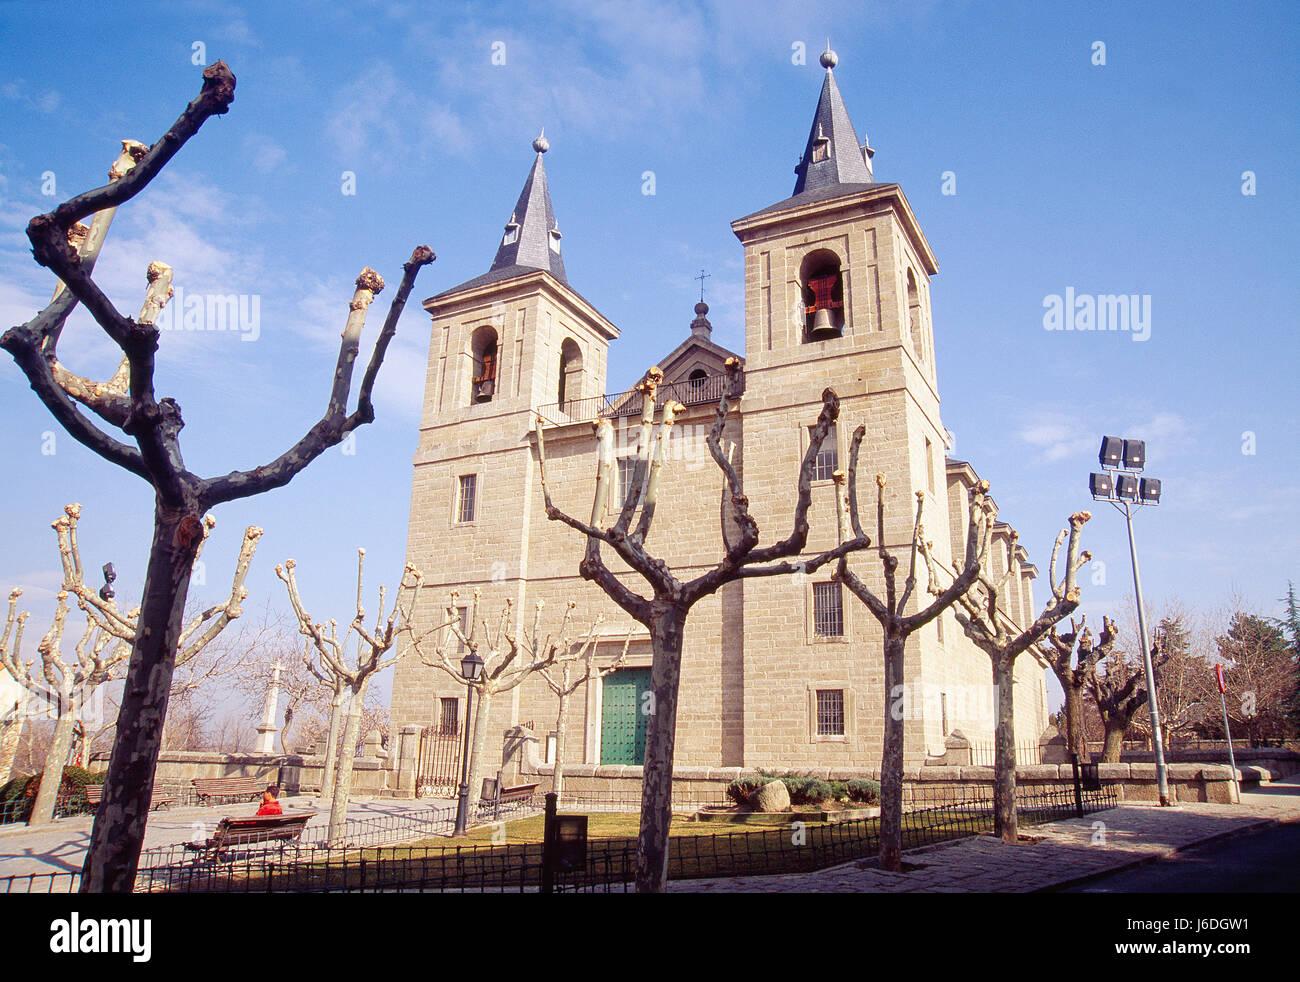 San Bernabe church. El Escorial, Madrid province, Spain. - Stock Image